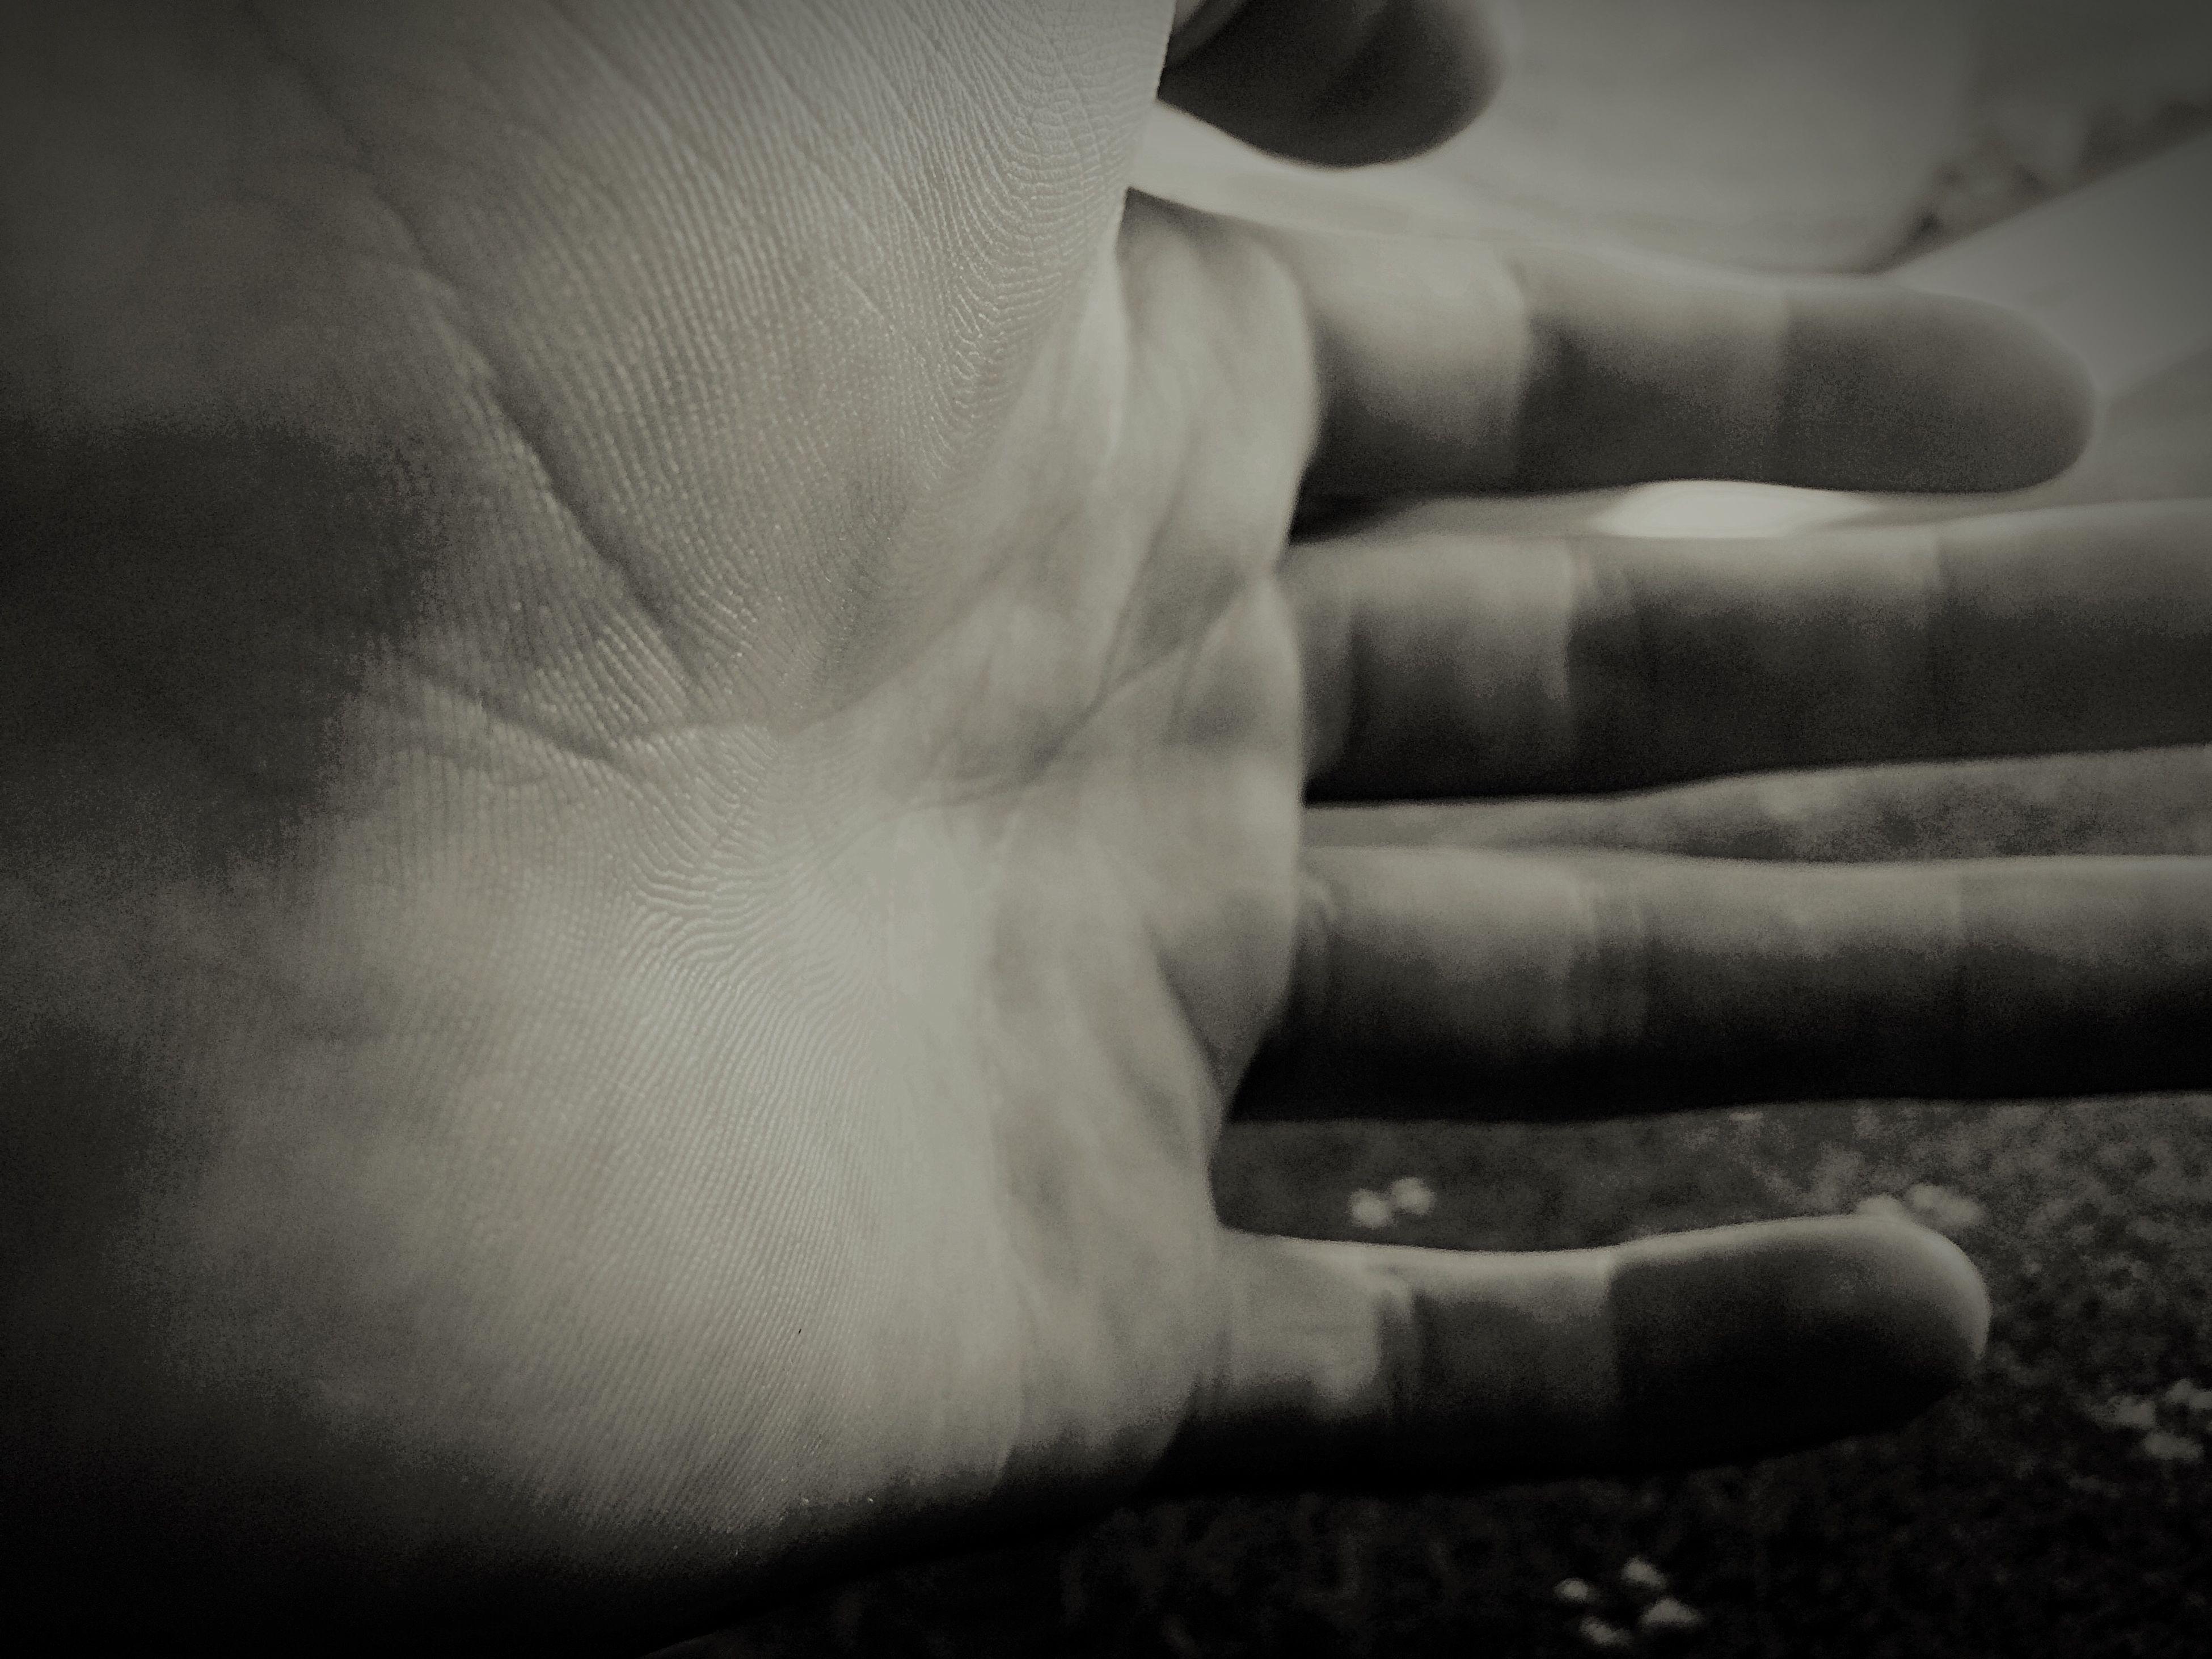 Human Hand Human Hand Black And White